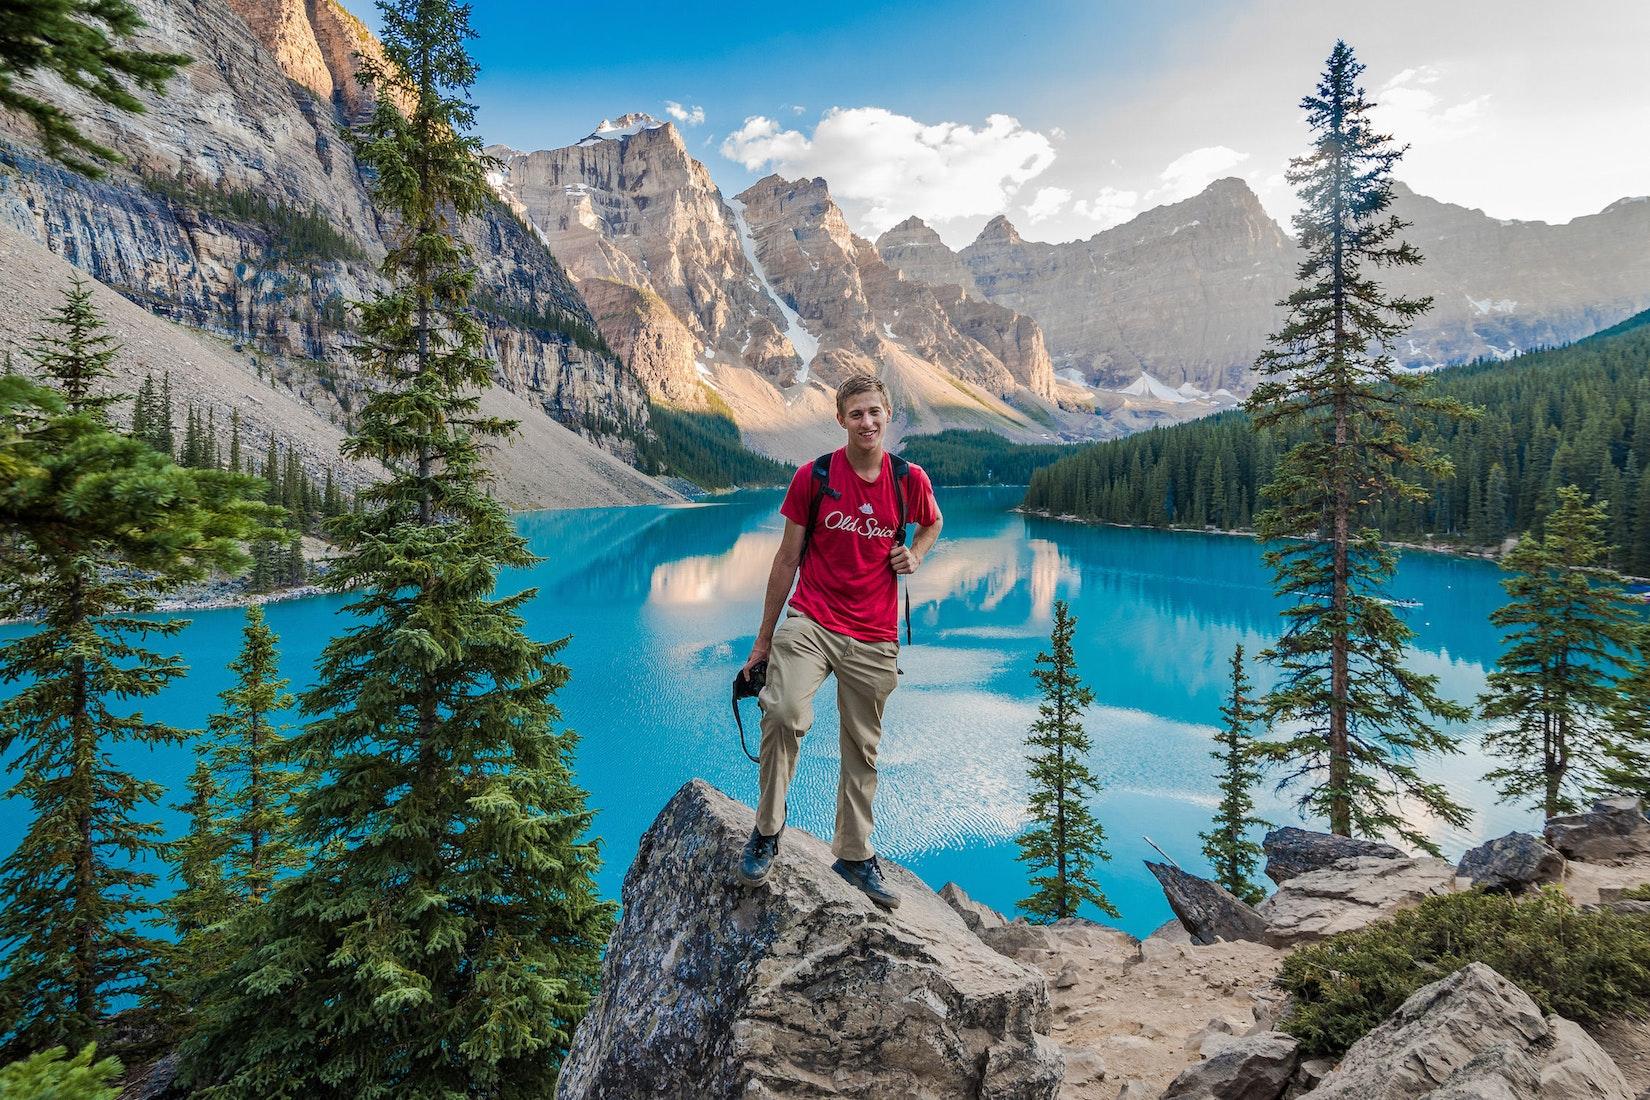 Chase Guttman: Traveler, Drone Photographer & Cinematographer